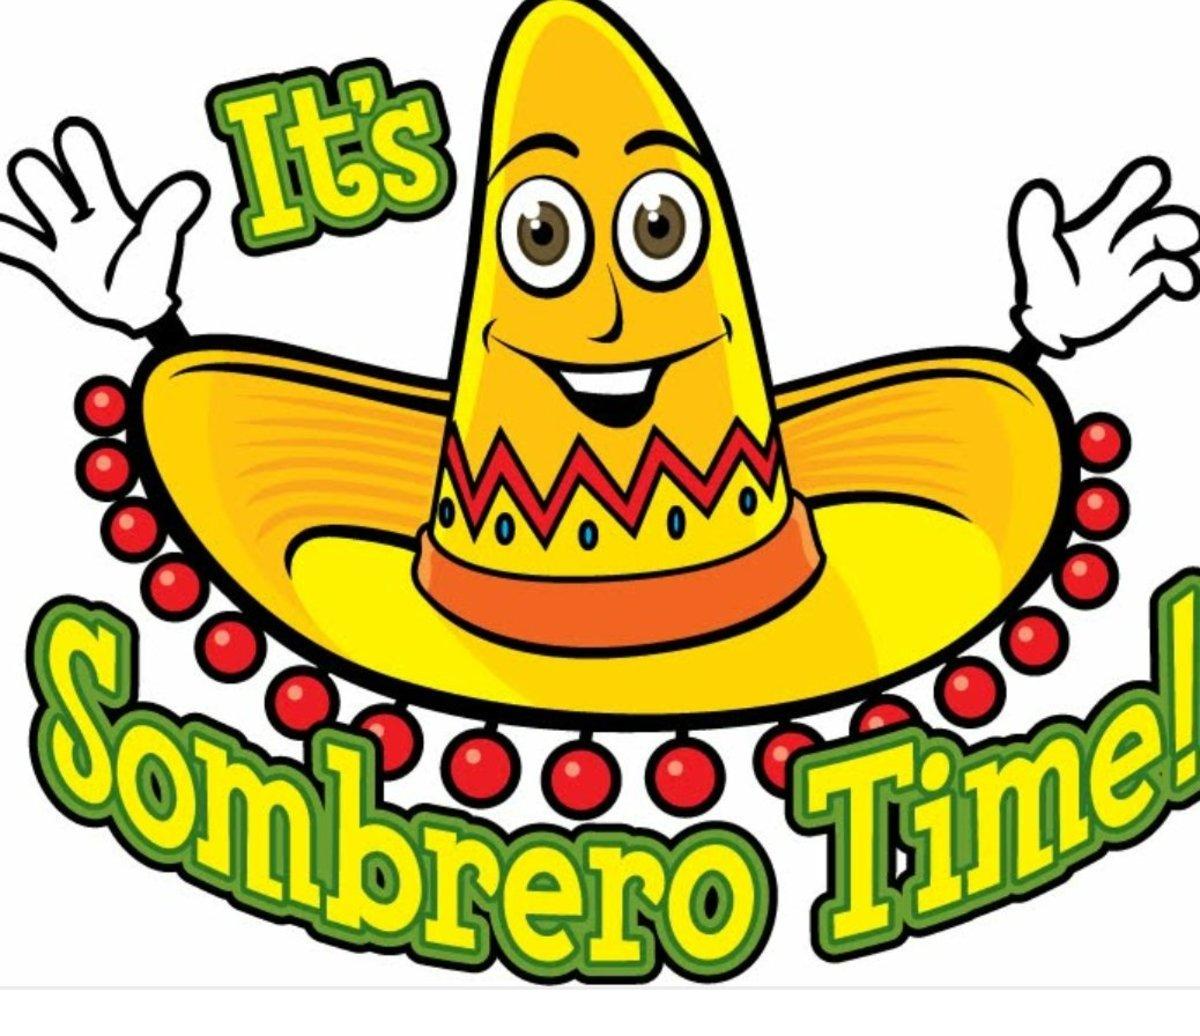 Four strikeouts? It's sombrero time!